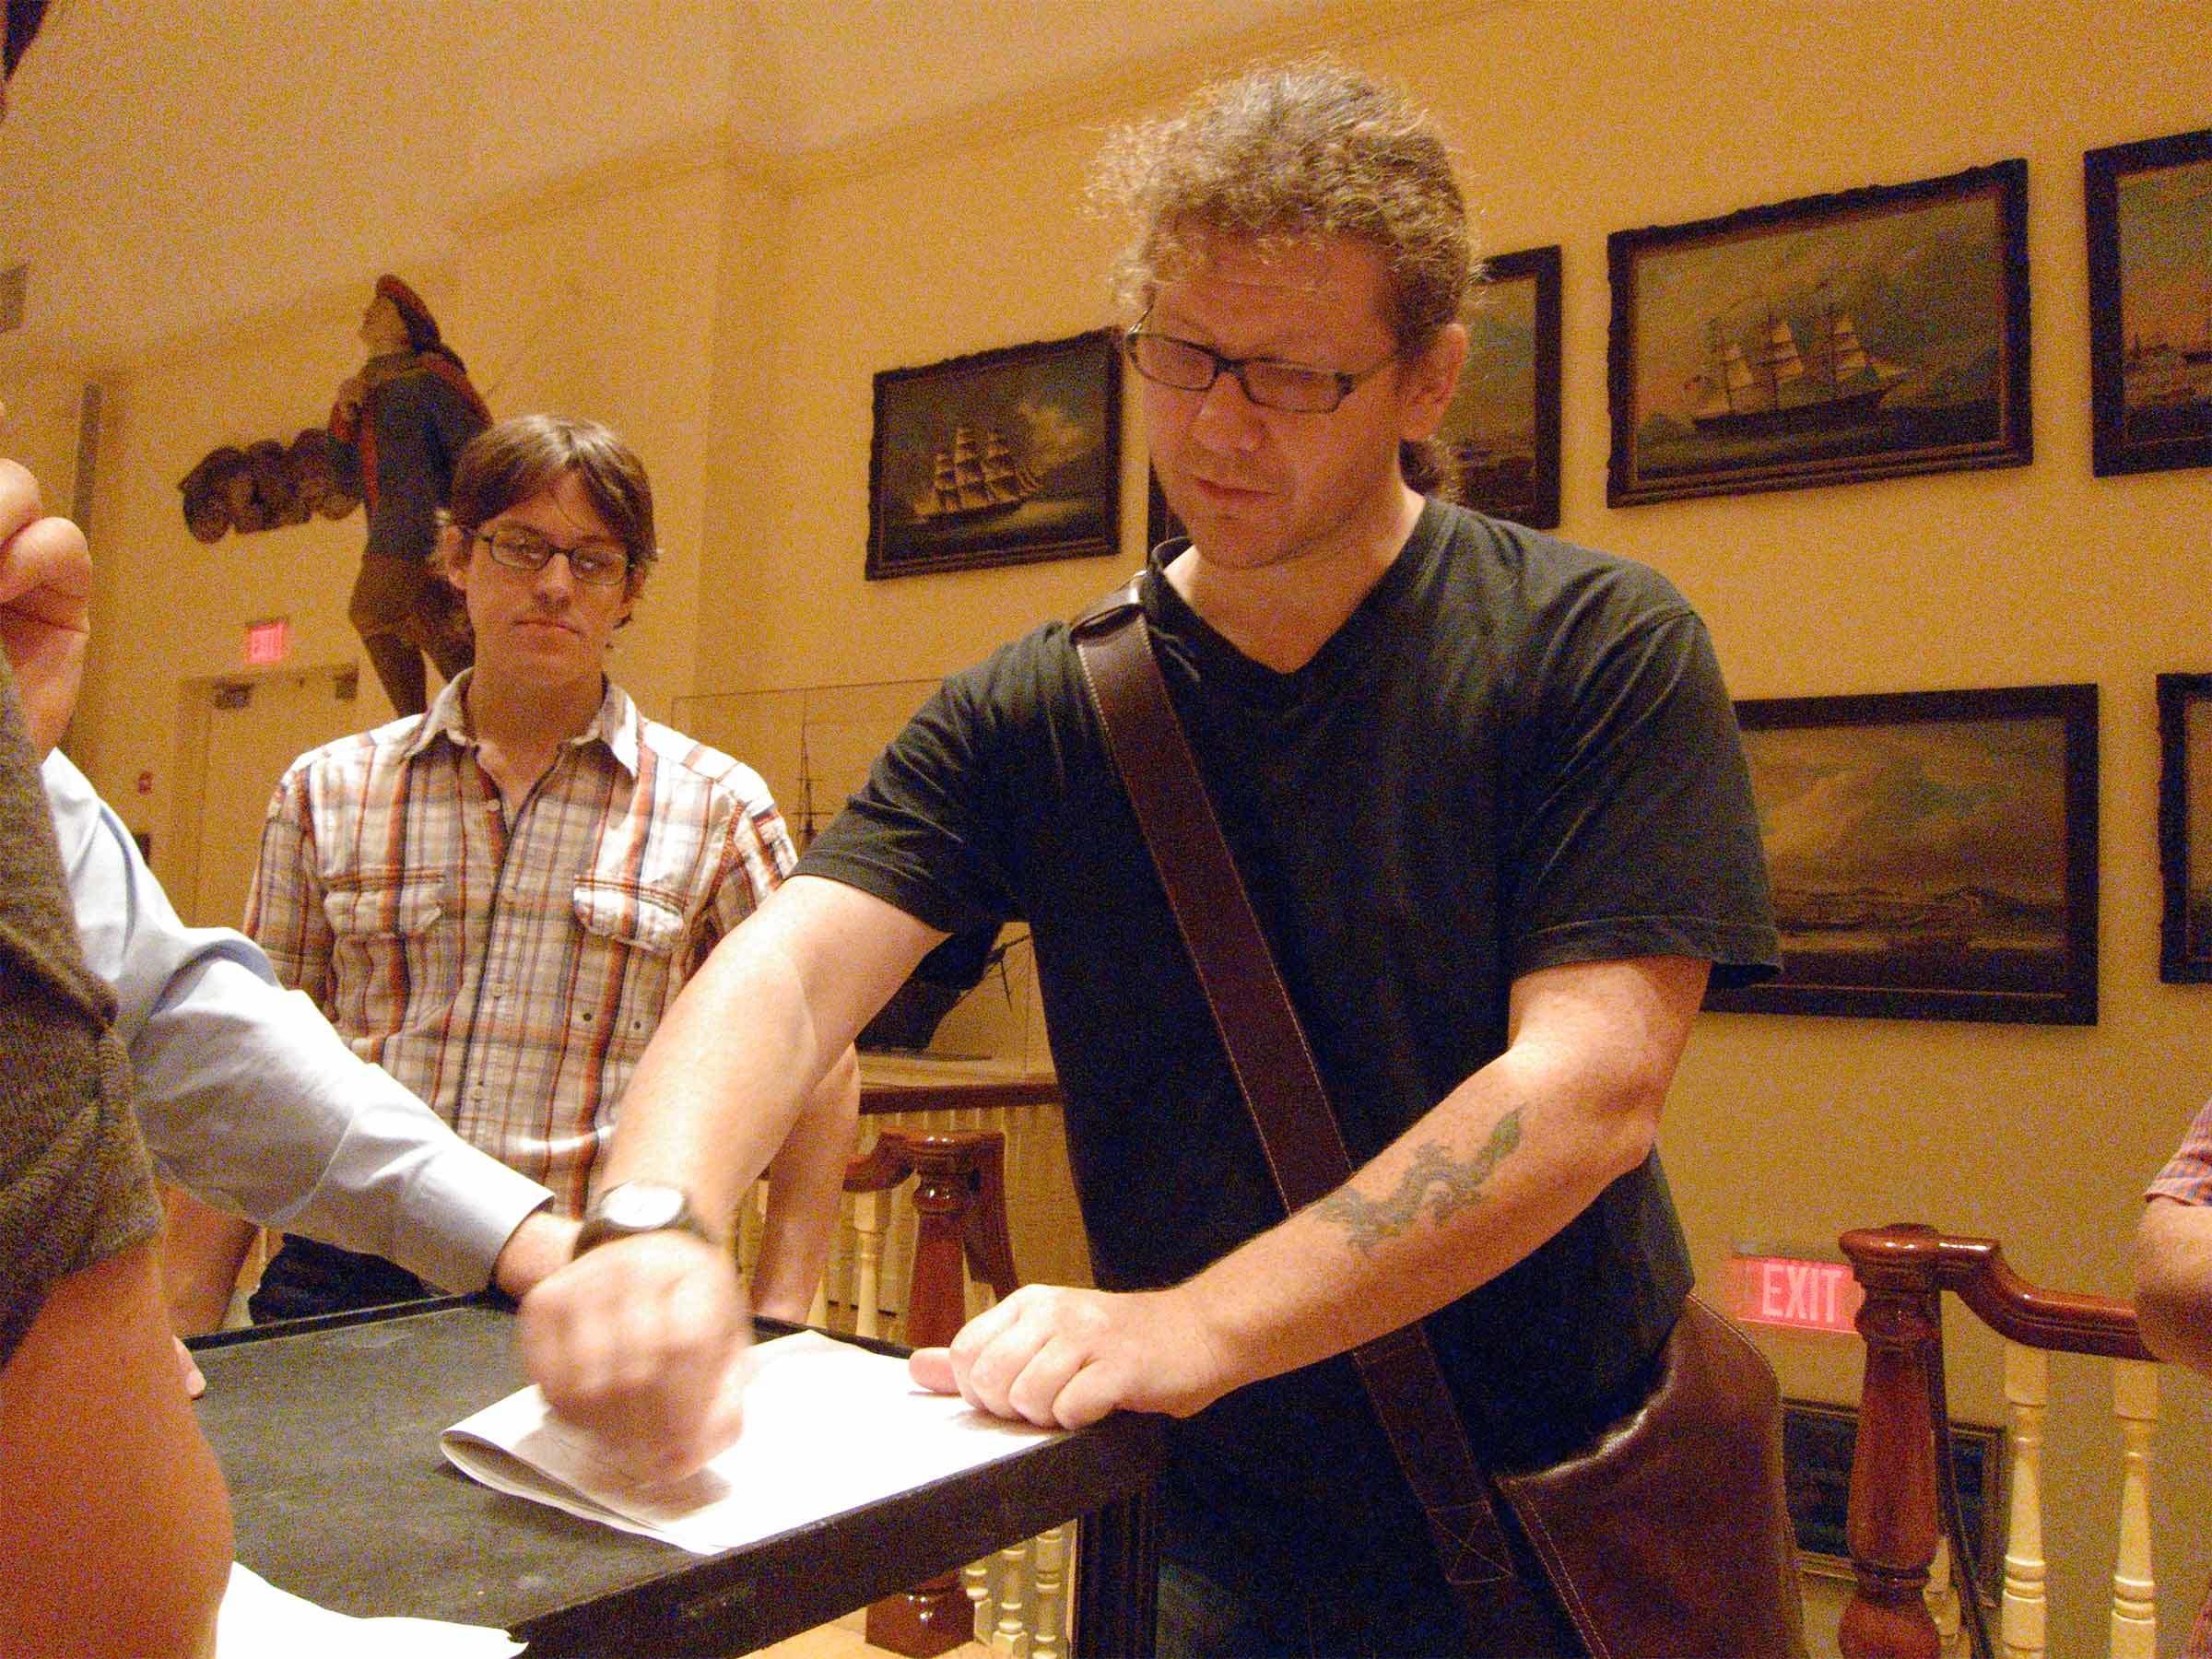 Chip Van Dyke and Charles Sandison in 2010